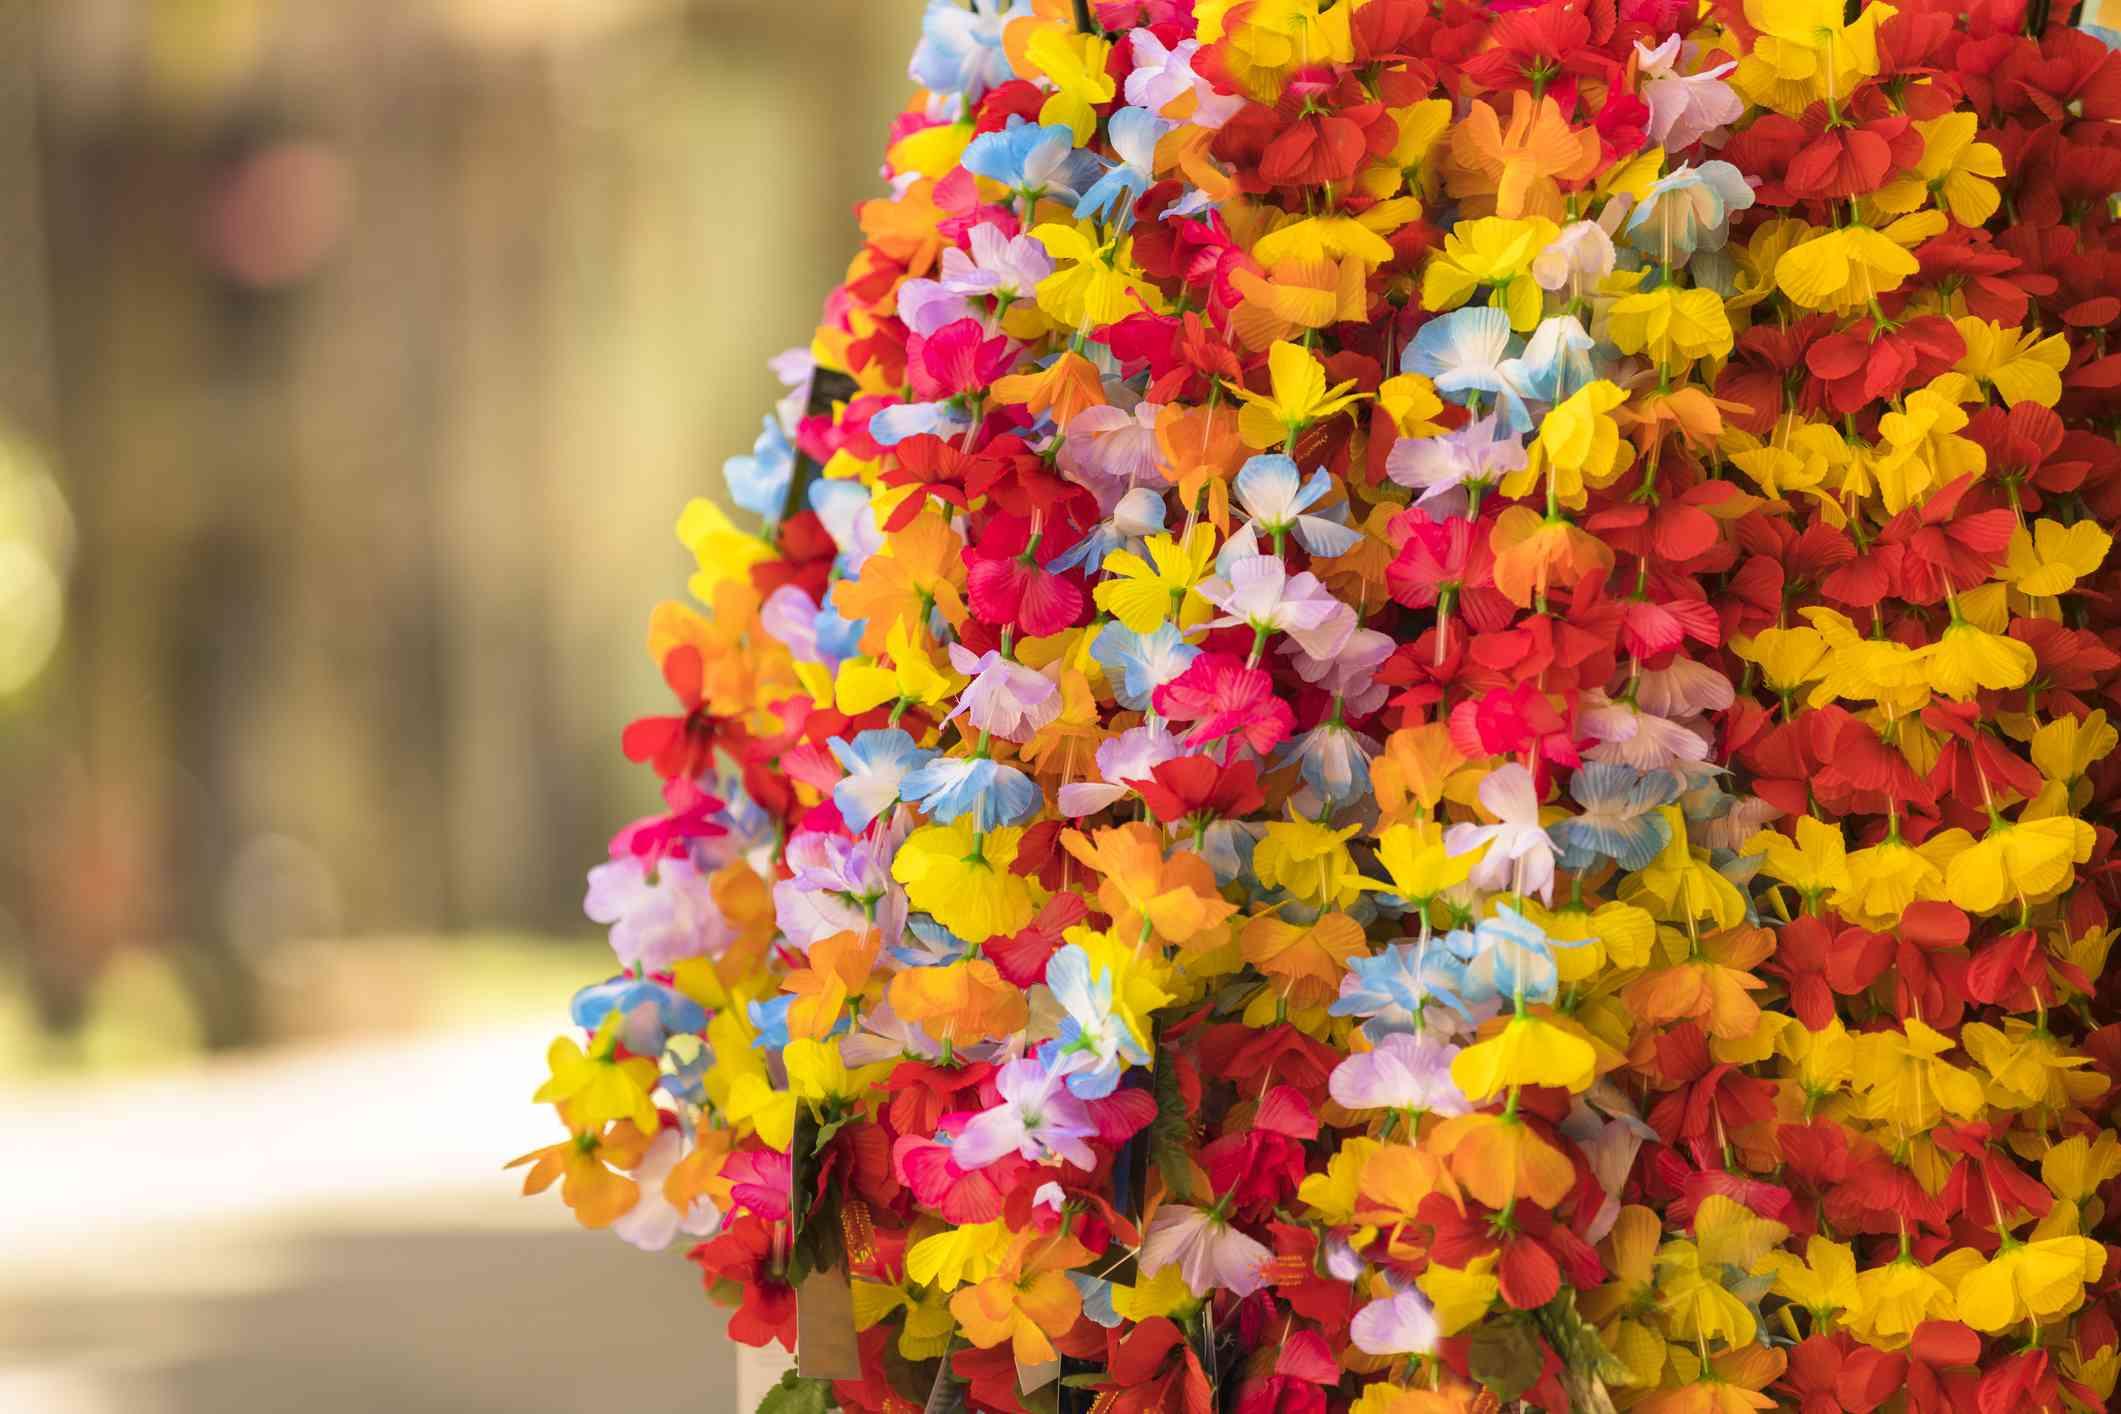 Colorful Hawaiian Lei Flower Necklaces For Sale in Honolulu Oahu